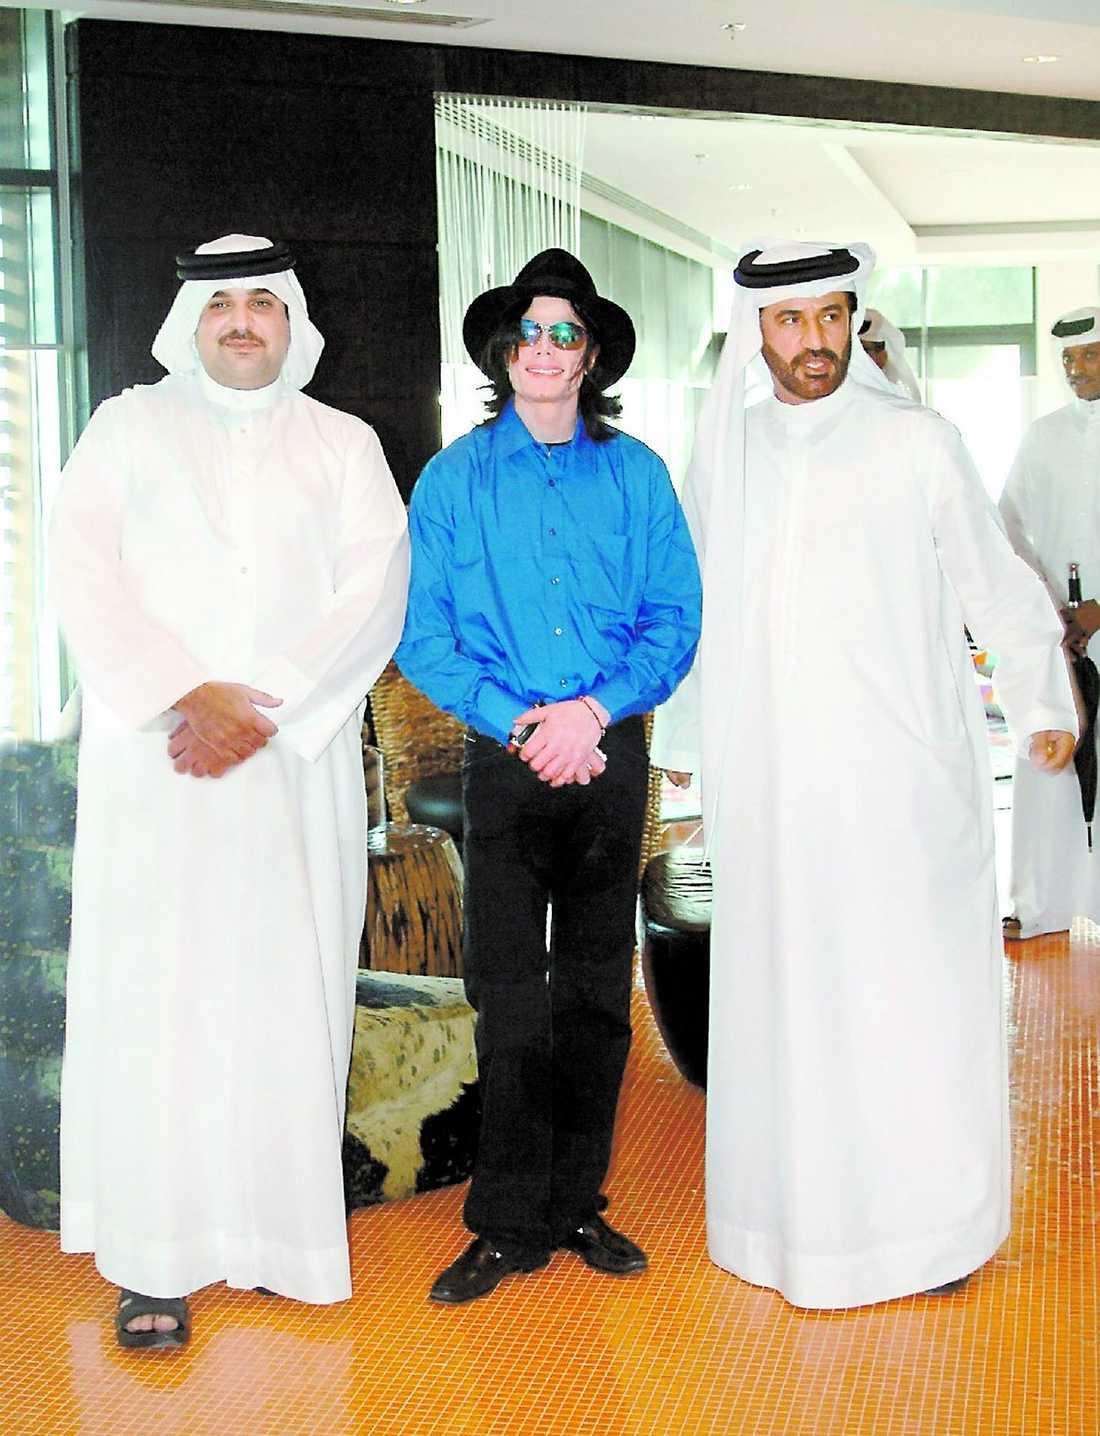 I Bahrain med shejk Abdullah bin Hamed Al Khalifa, son till Bahrains kung.